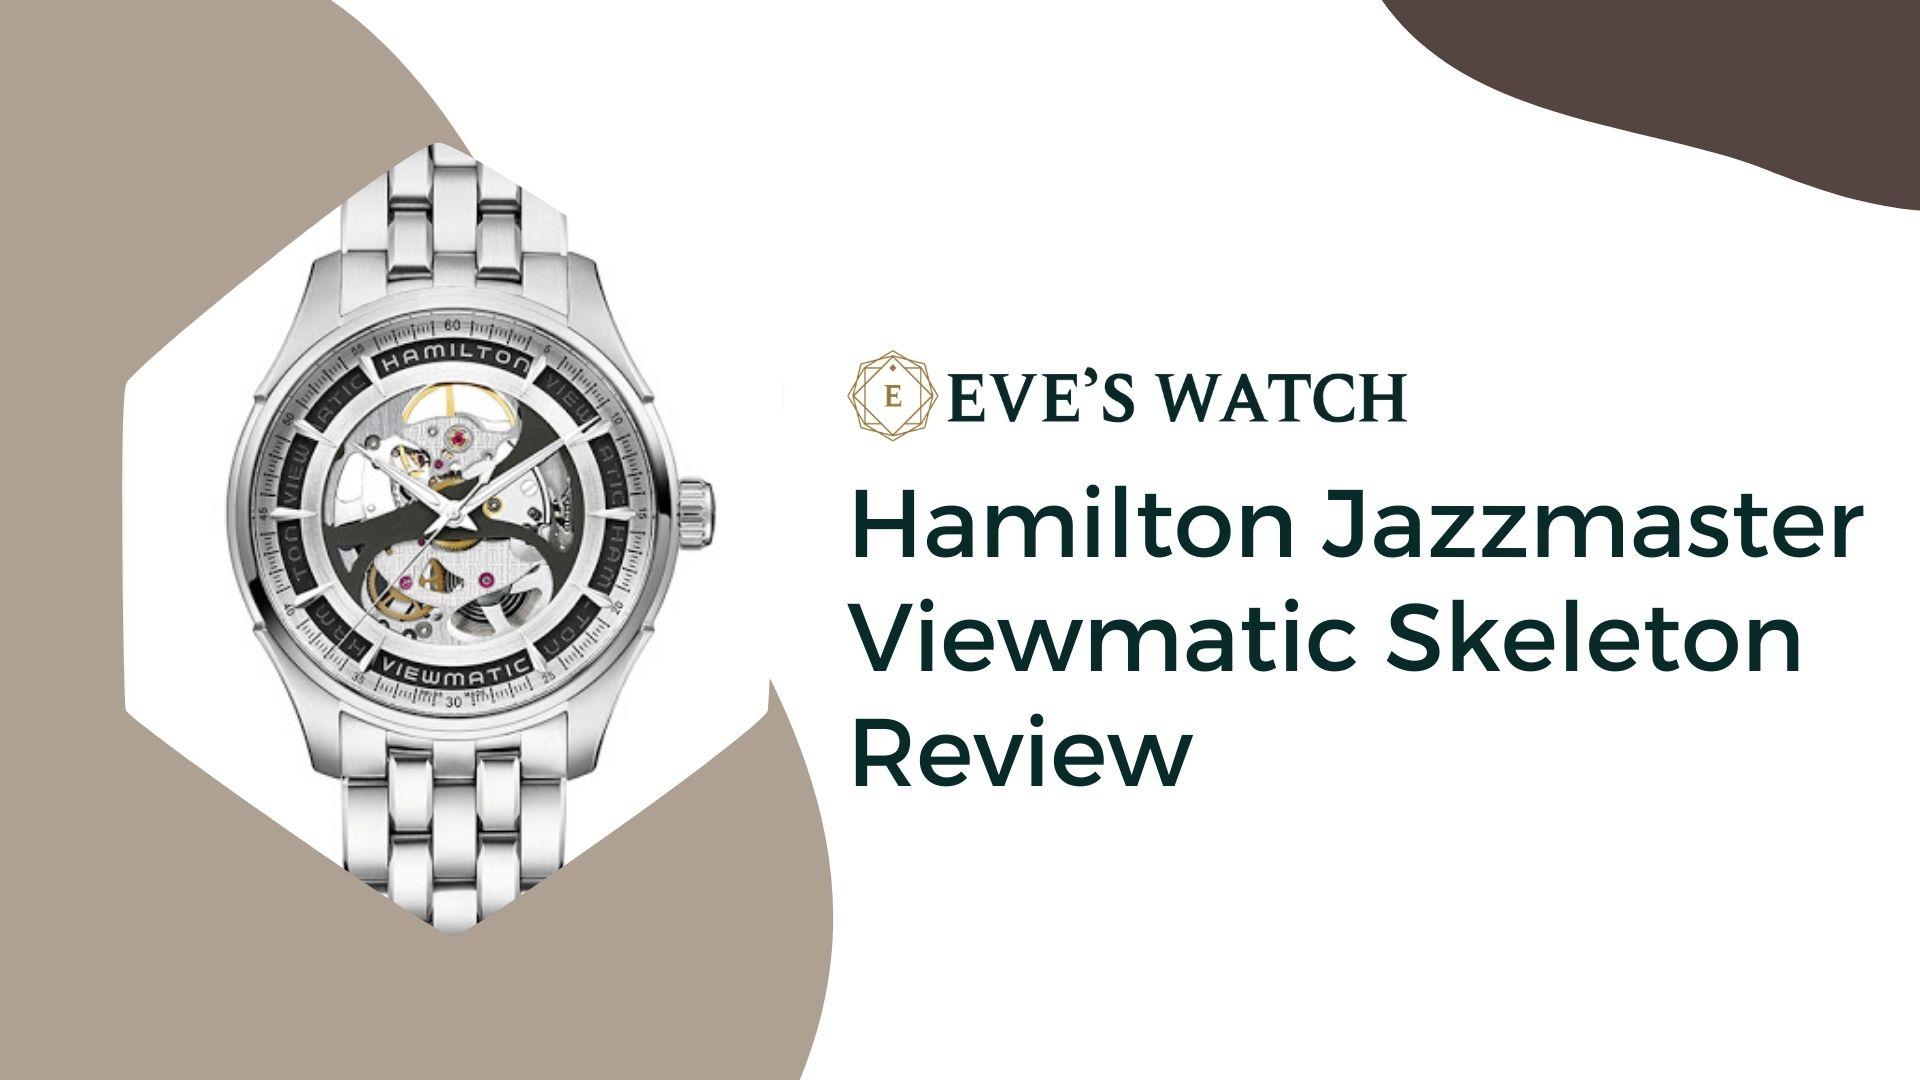 hamilton jazzmaster viewmatic skeleton review